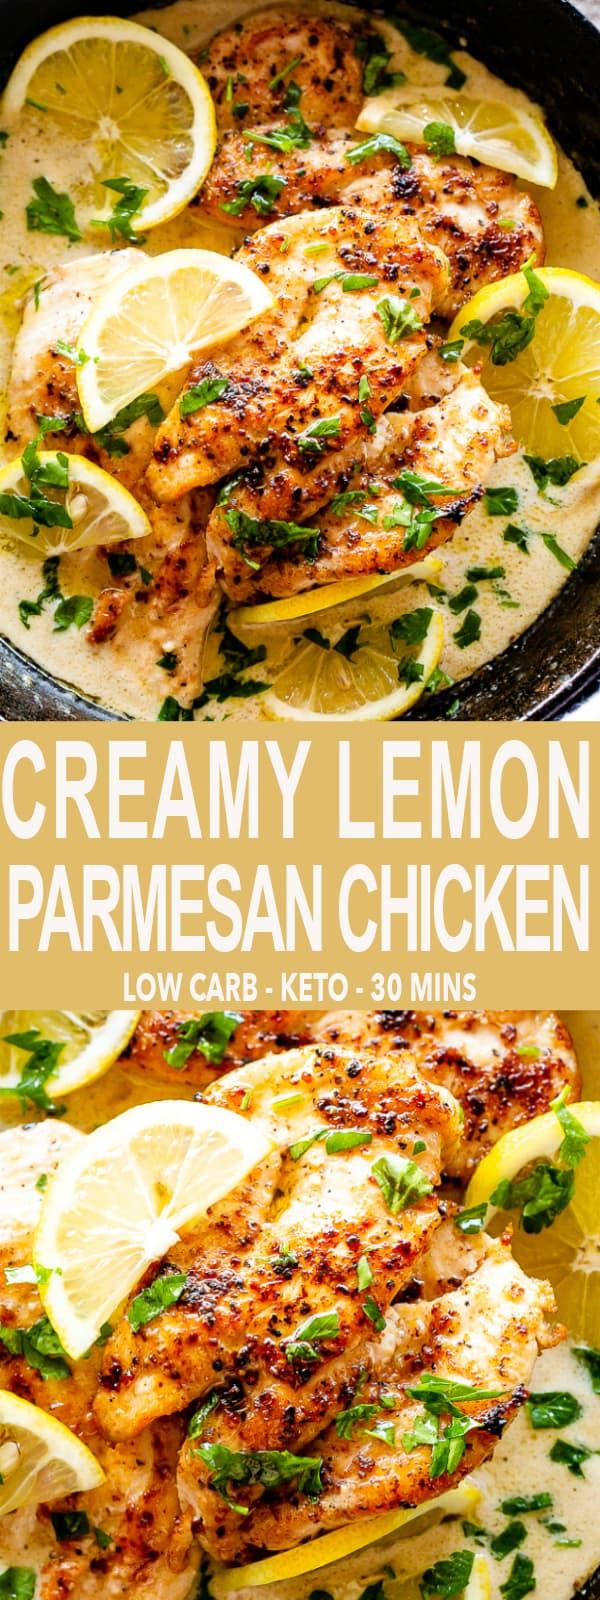 Creamy Lemon Parmesan Chicken Collage Pin